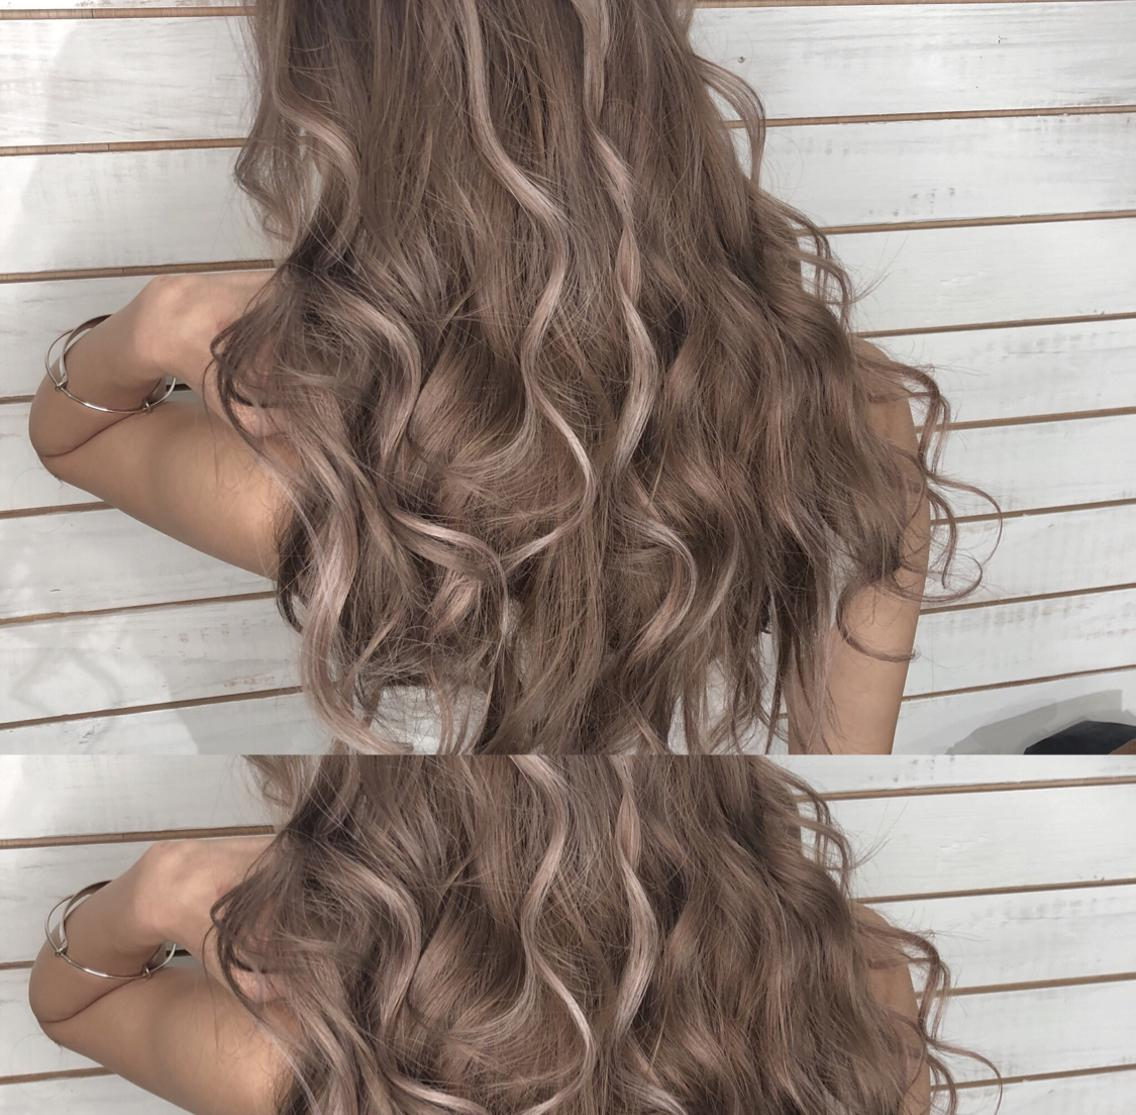 Beee  hair salon所属・エクステ指名No.1 代表山森伴利の掲載